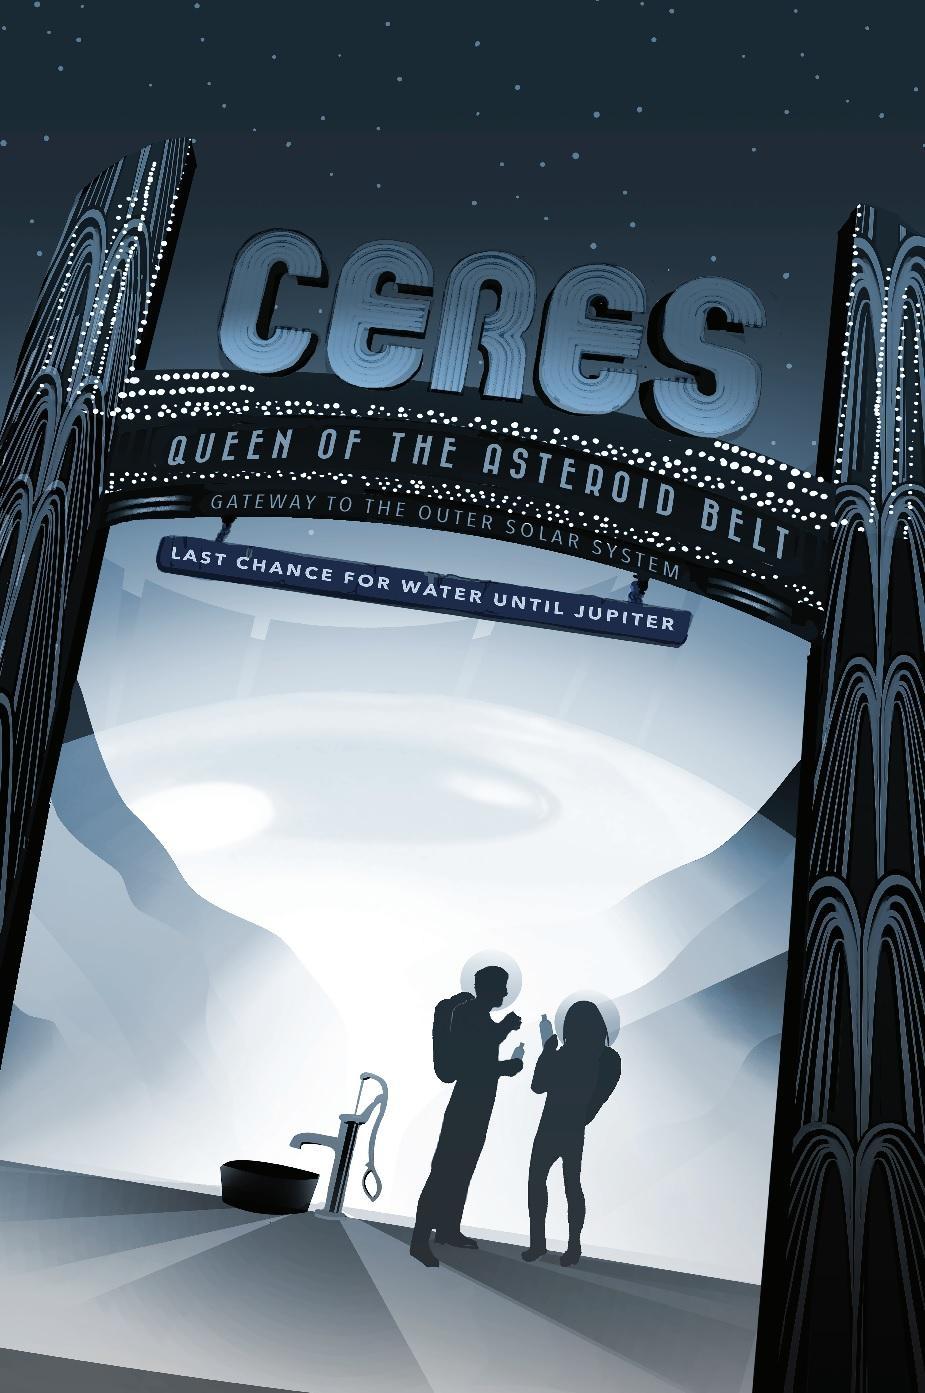 Poster invitado a pasar por el mini planeta Ceres